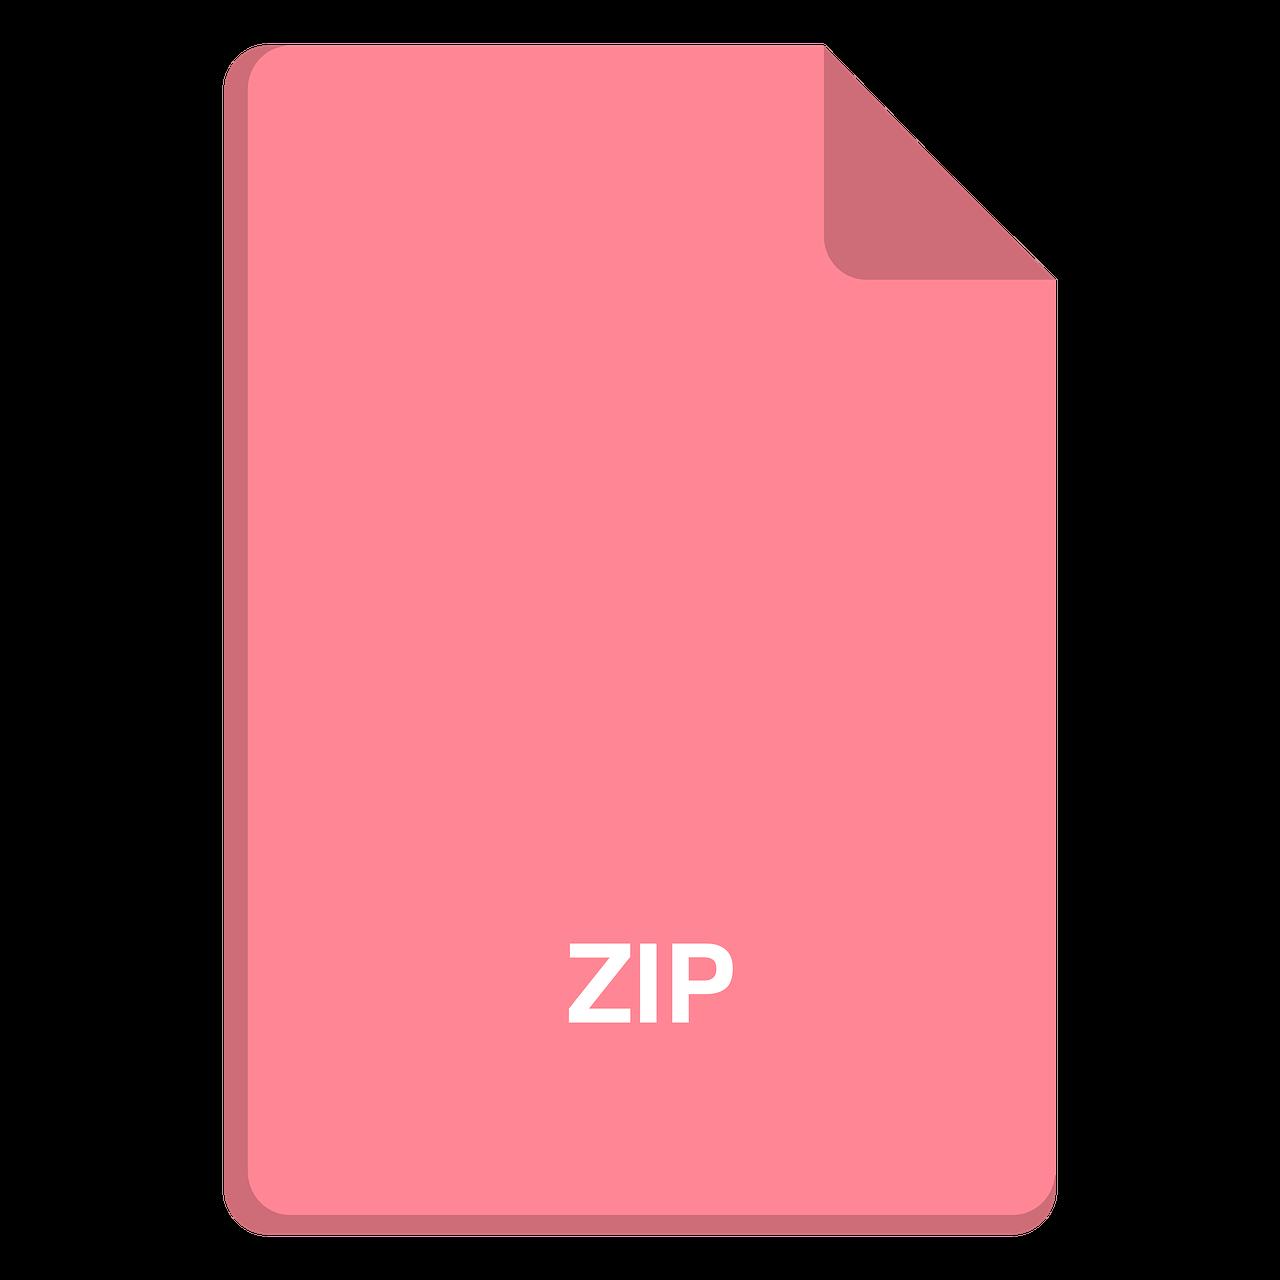 Best Tools to Extract Zip files